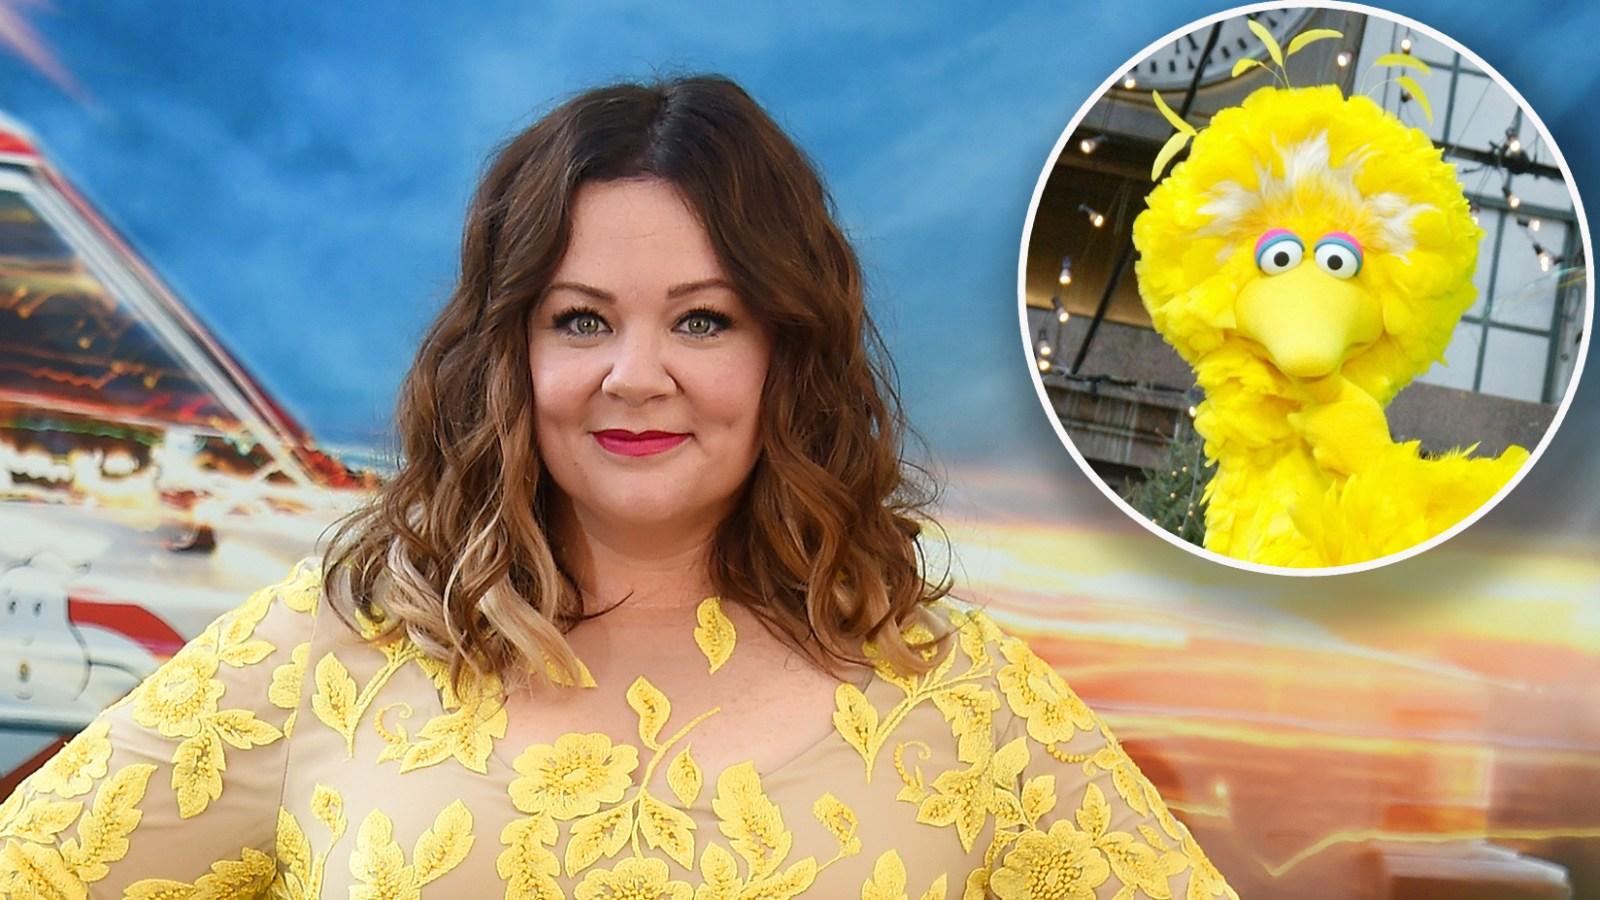 Anti Vaxxers Convinced Sesame Street >> Sesame Street Creators Sue Producers Of Melissa Mccarthy Puppet Film